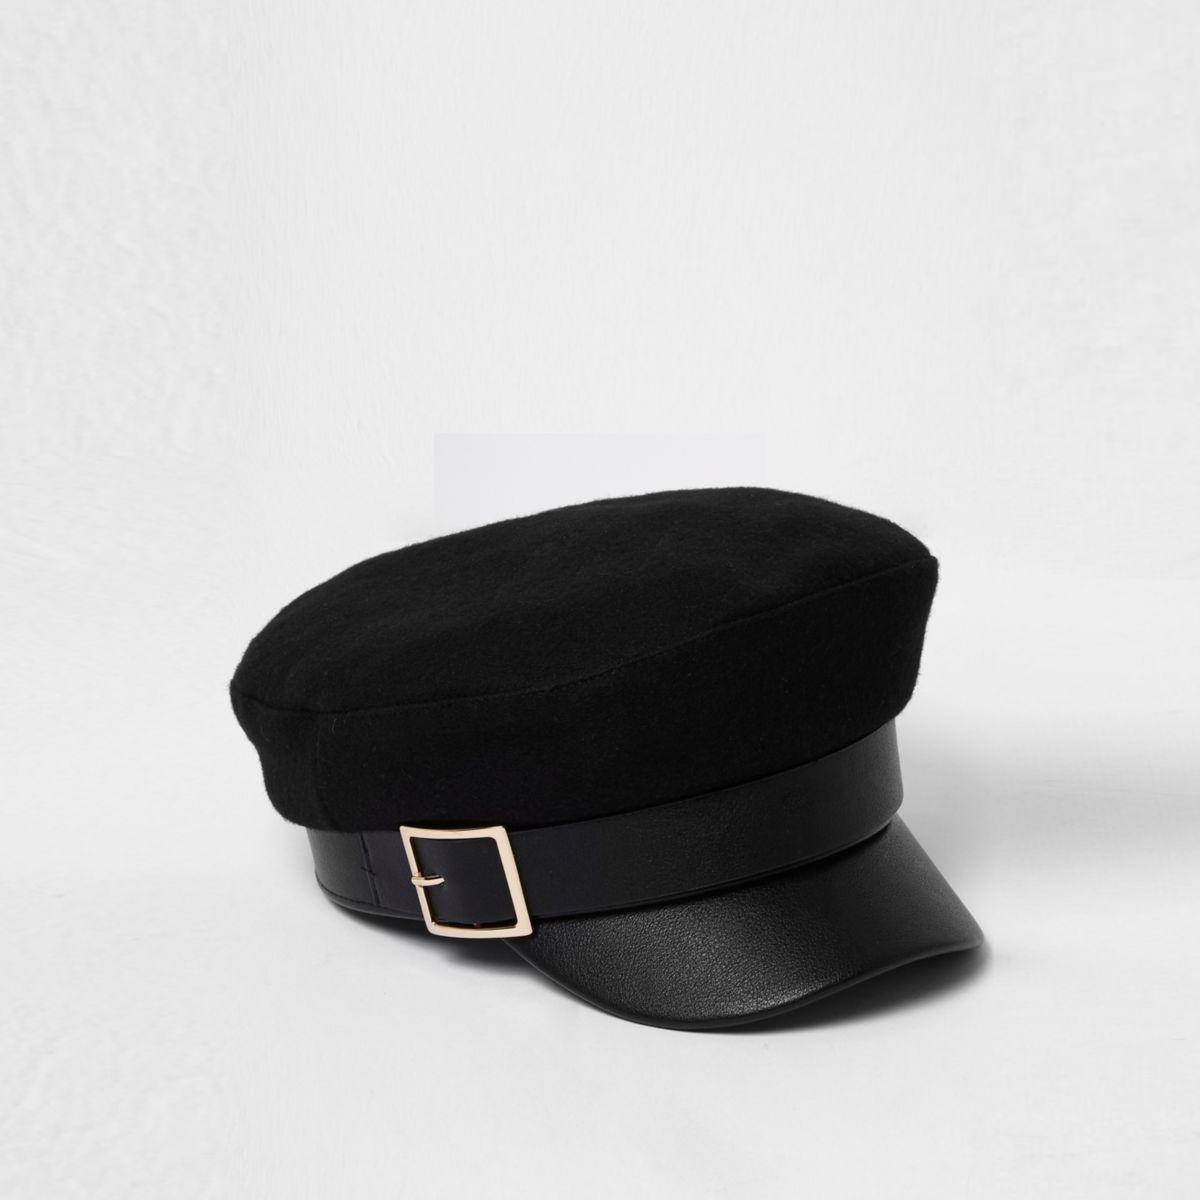 Black gold buckle baker boy hat - Hats - Accessories - women